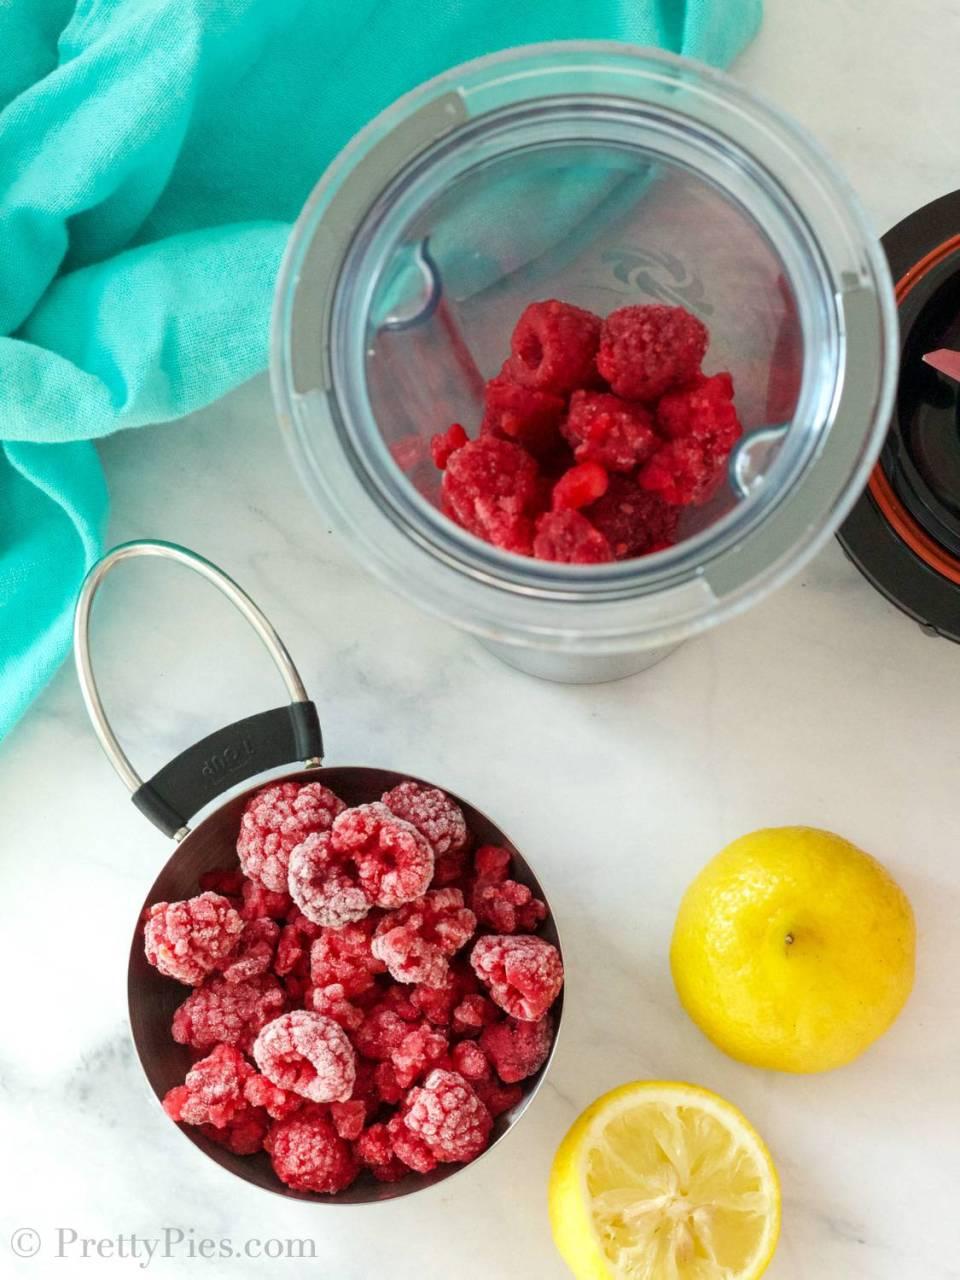 Frozen raspberries in a cup